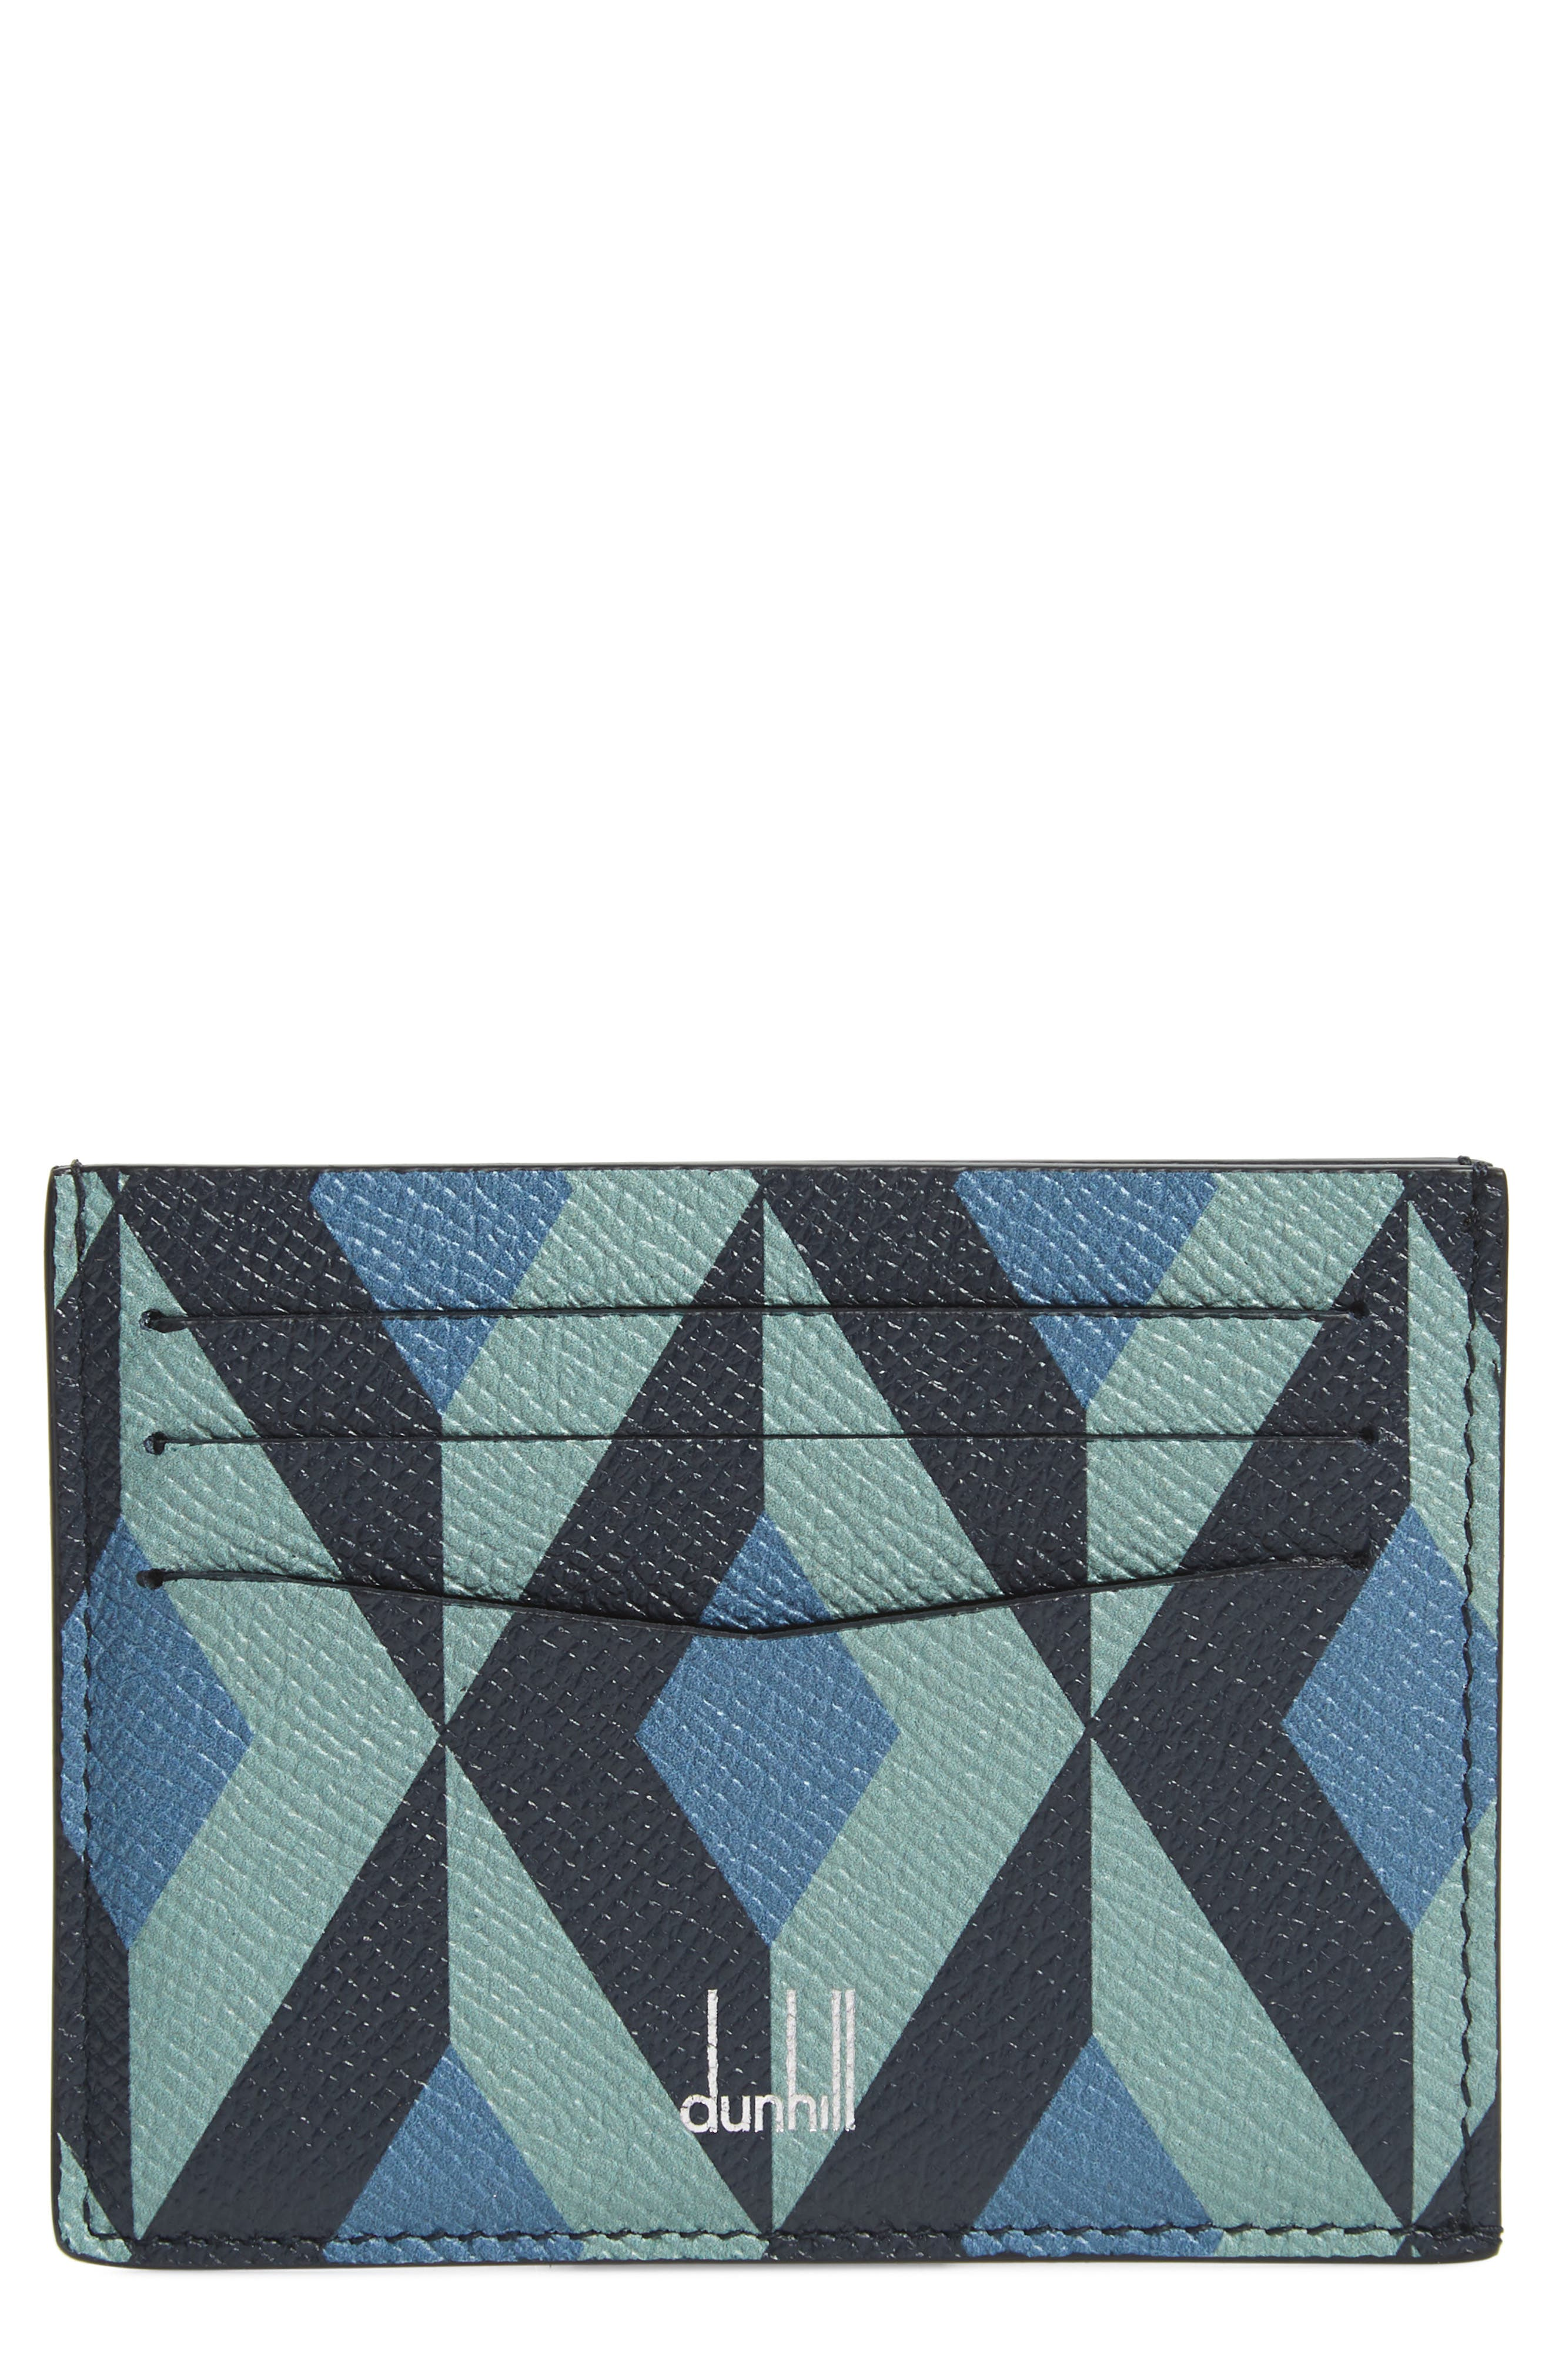 DUNHILL Cadogan Leather Card Case, Main, color, STONE BLUE